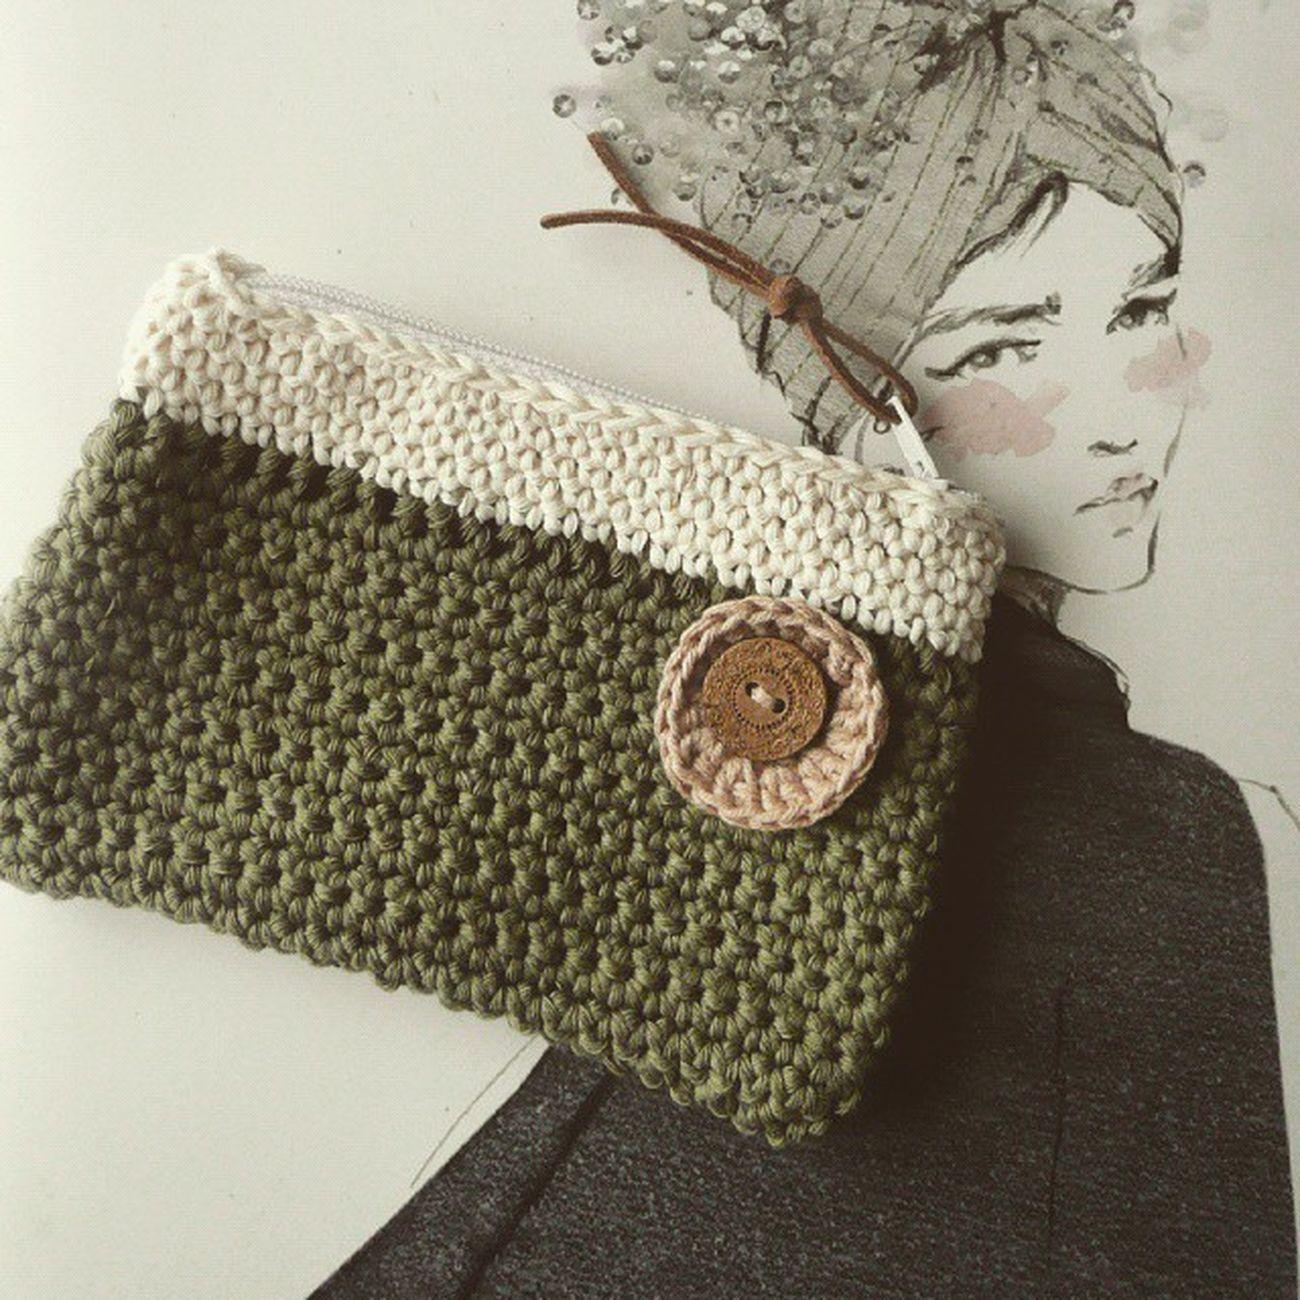 Ganchillo Crochet Handmade Handmadewithlove Coinpurse Yarn Drops Cottonlight Hook Artesania